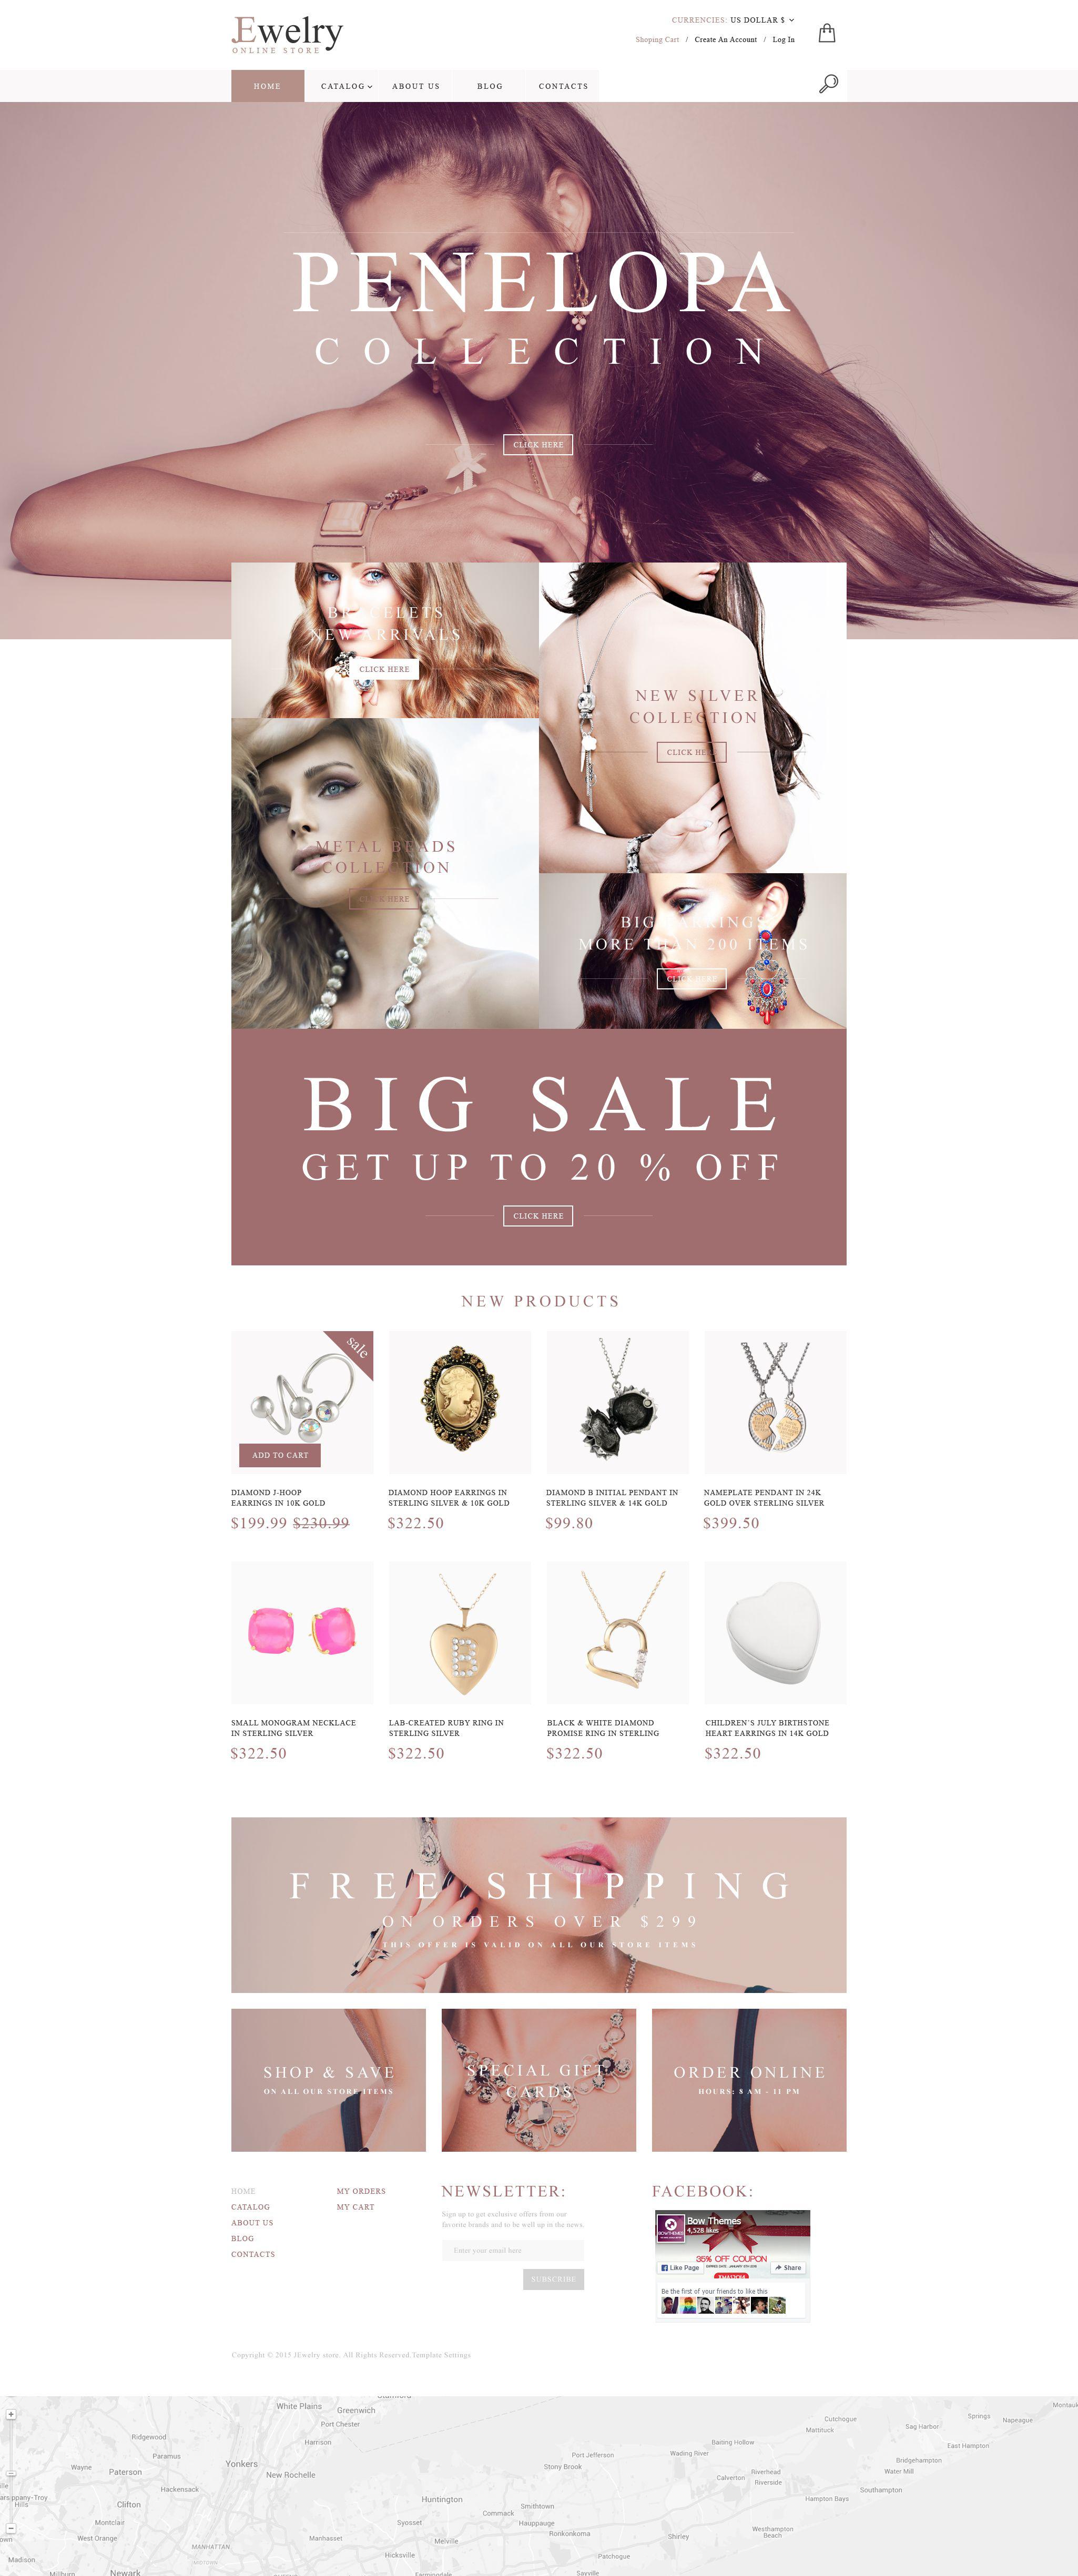 Jewelry House VirtueMart Template - screenshot